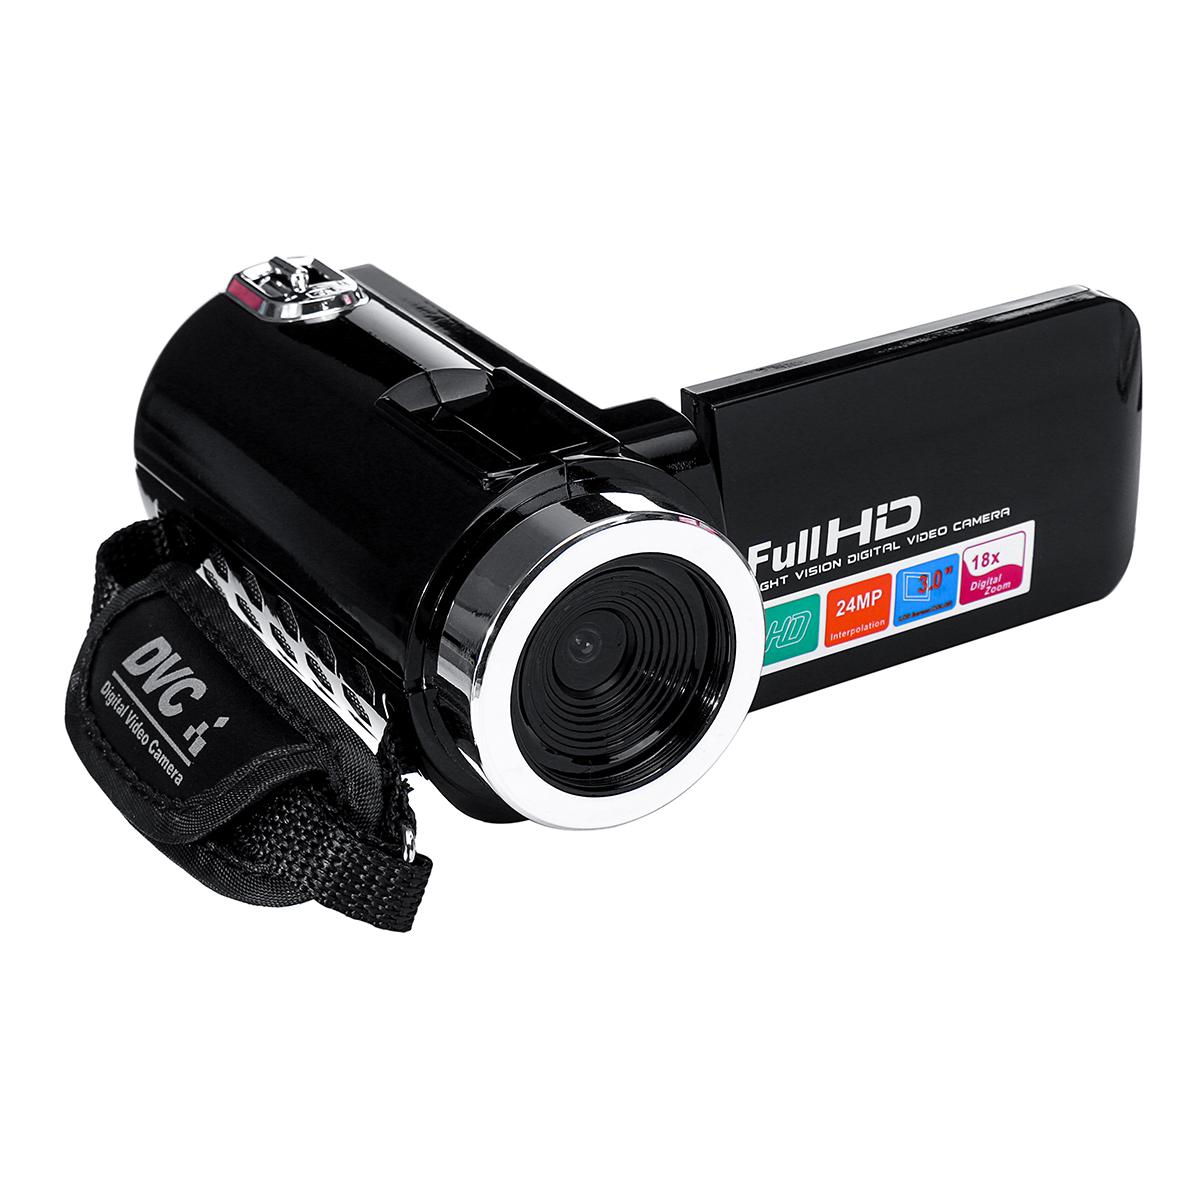 4K Full HD 1080P 24MP 18X Zoom 3 дюймов LCD Цифровая видеокамера Video DV камера 5.0MP CMOS Датчик для видеоблогов YouTu - фото 12cbccca-34bb-4b76-802f-9d8a11ca1160.jpg